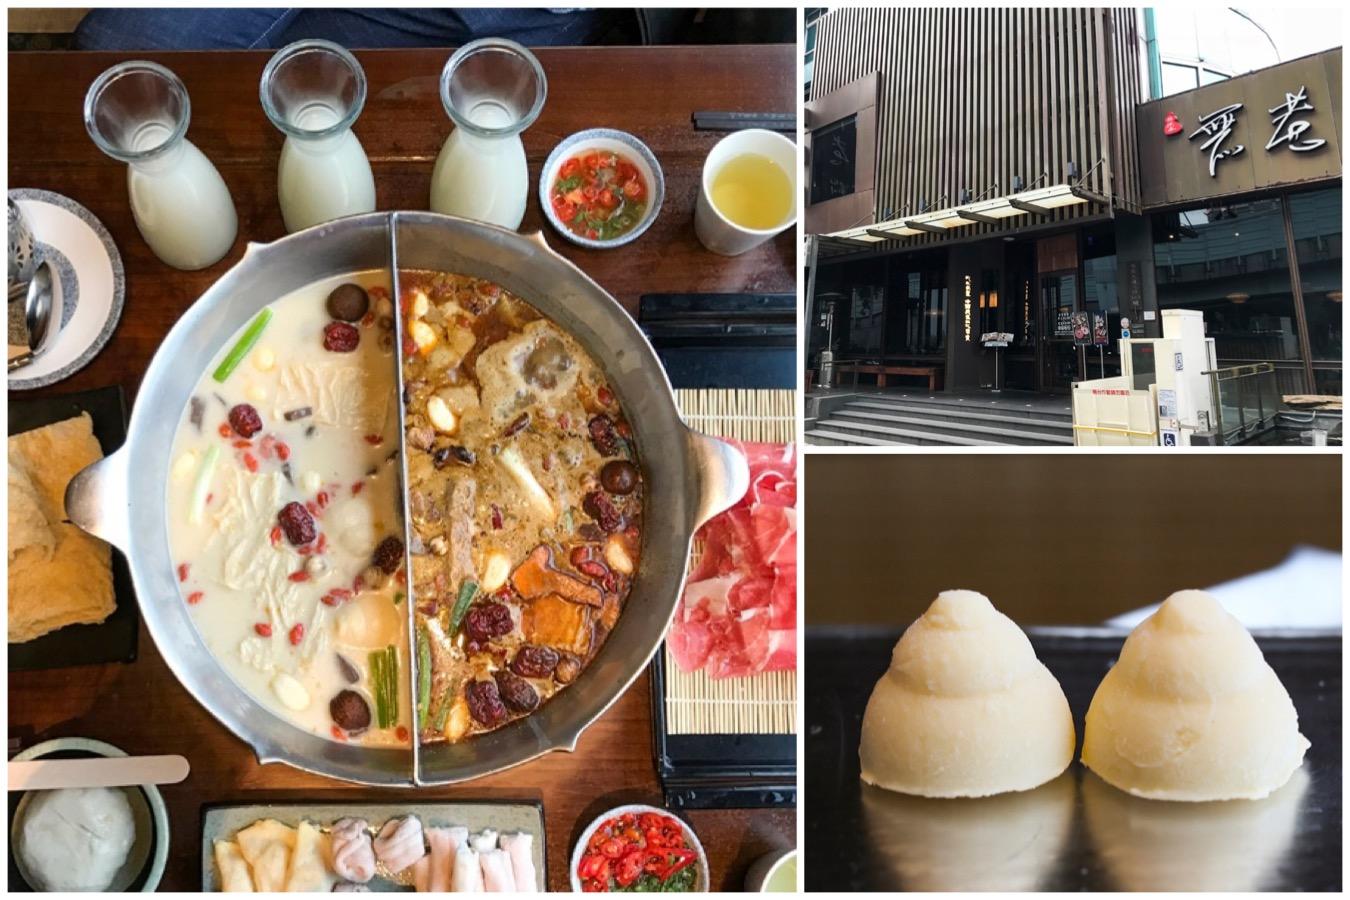 Wu Lao Guo 無老鍋 - Elixir Health Pot Is One Of Taipei's Best Hotpot Restaurants